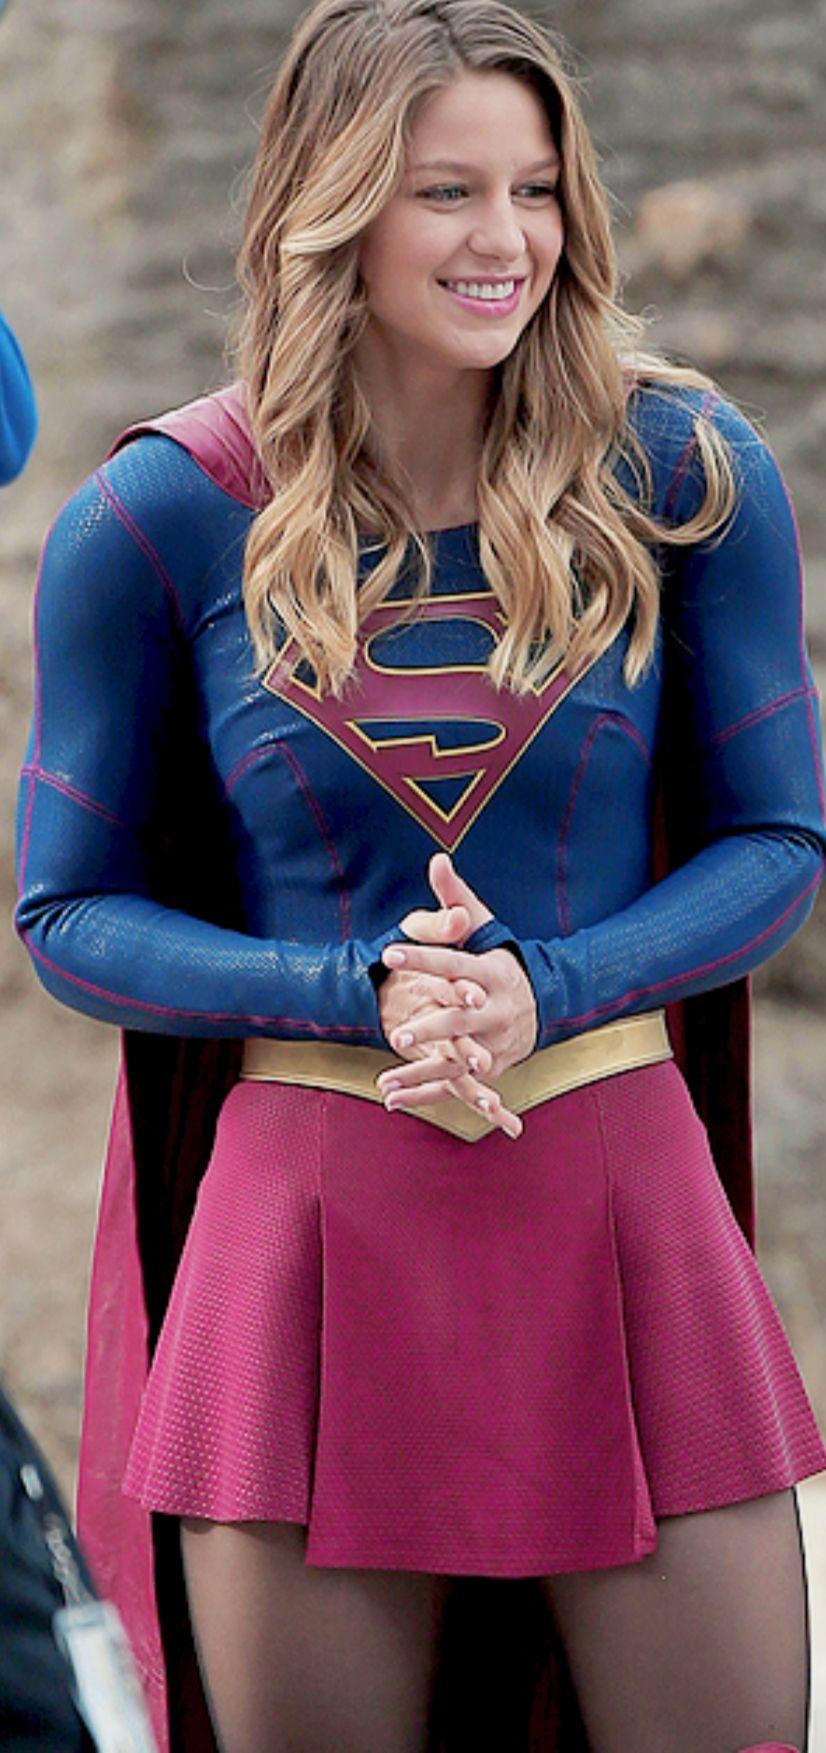 Melissa Benoist   Melissa benoist, Supergirl, Supergirl tv